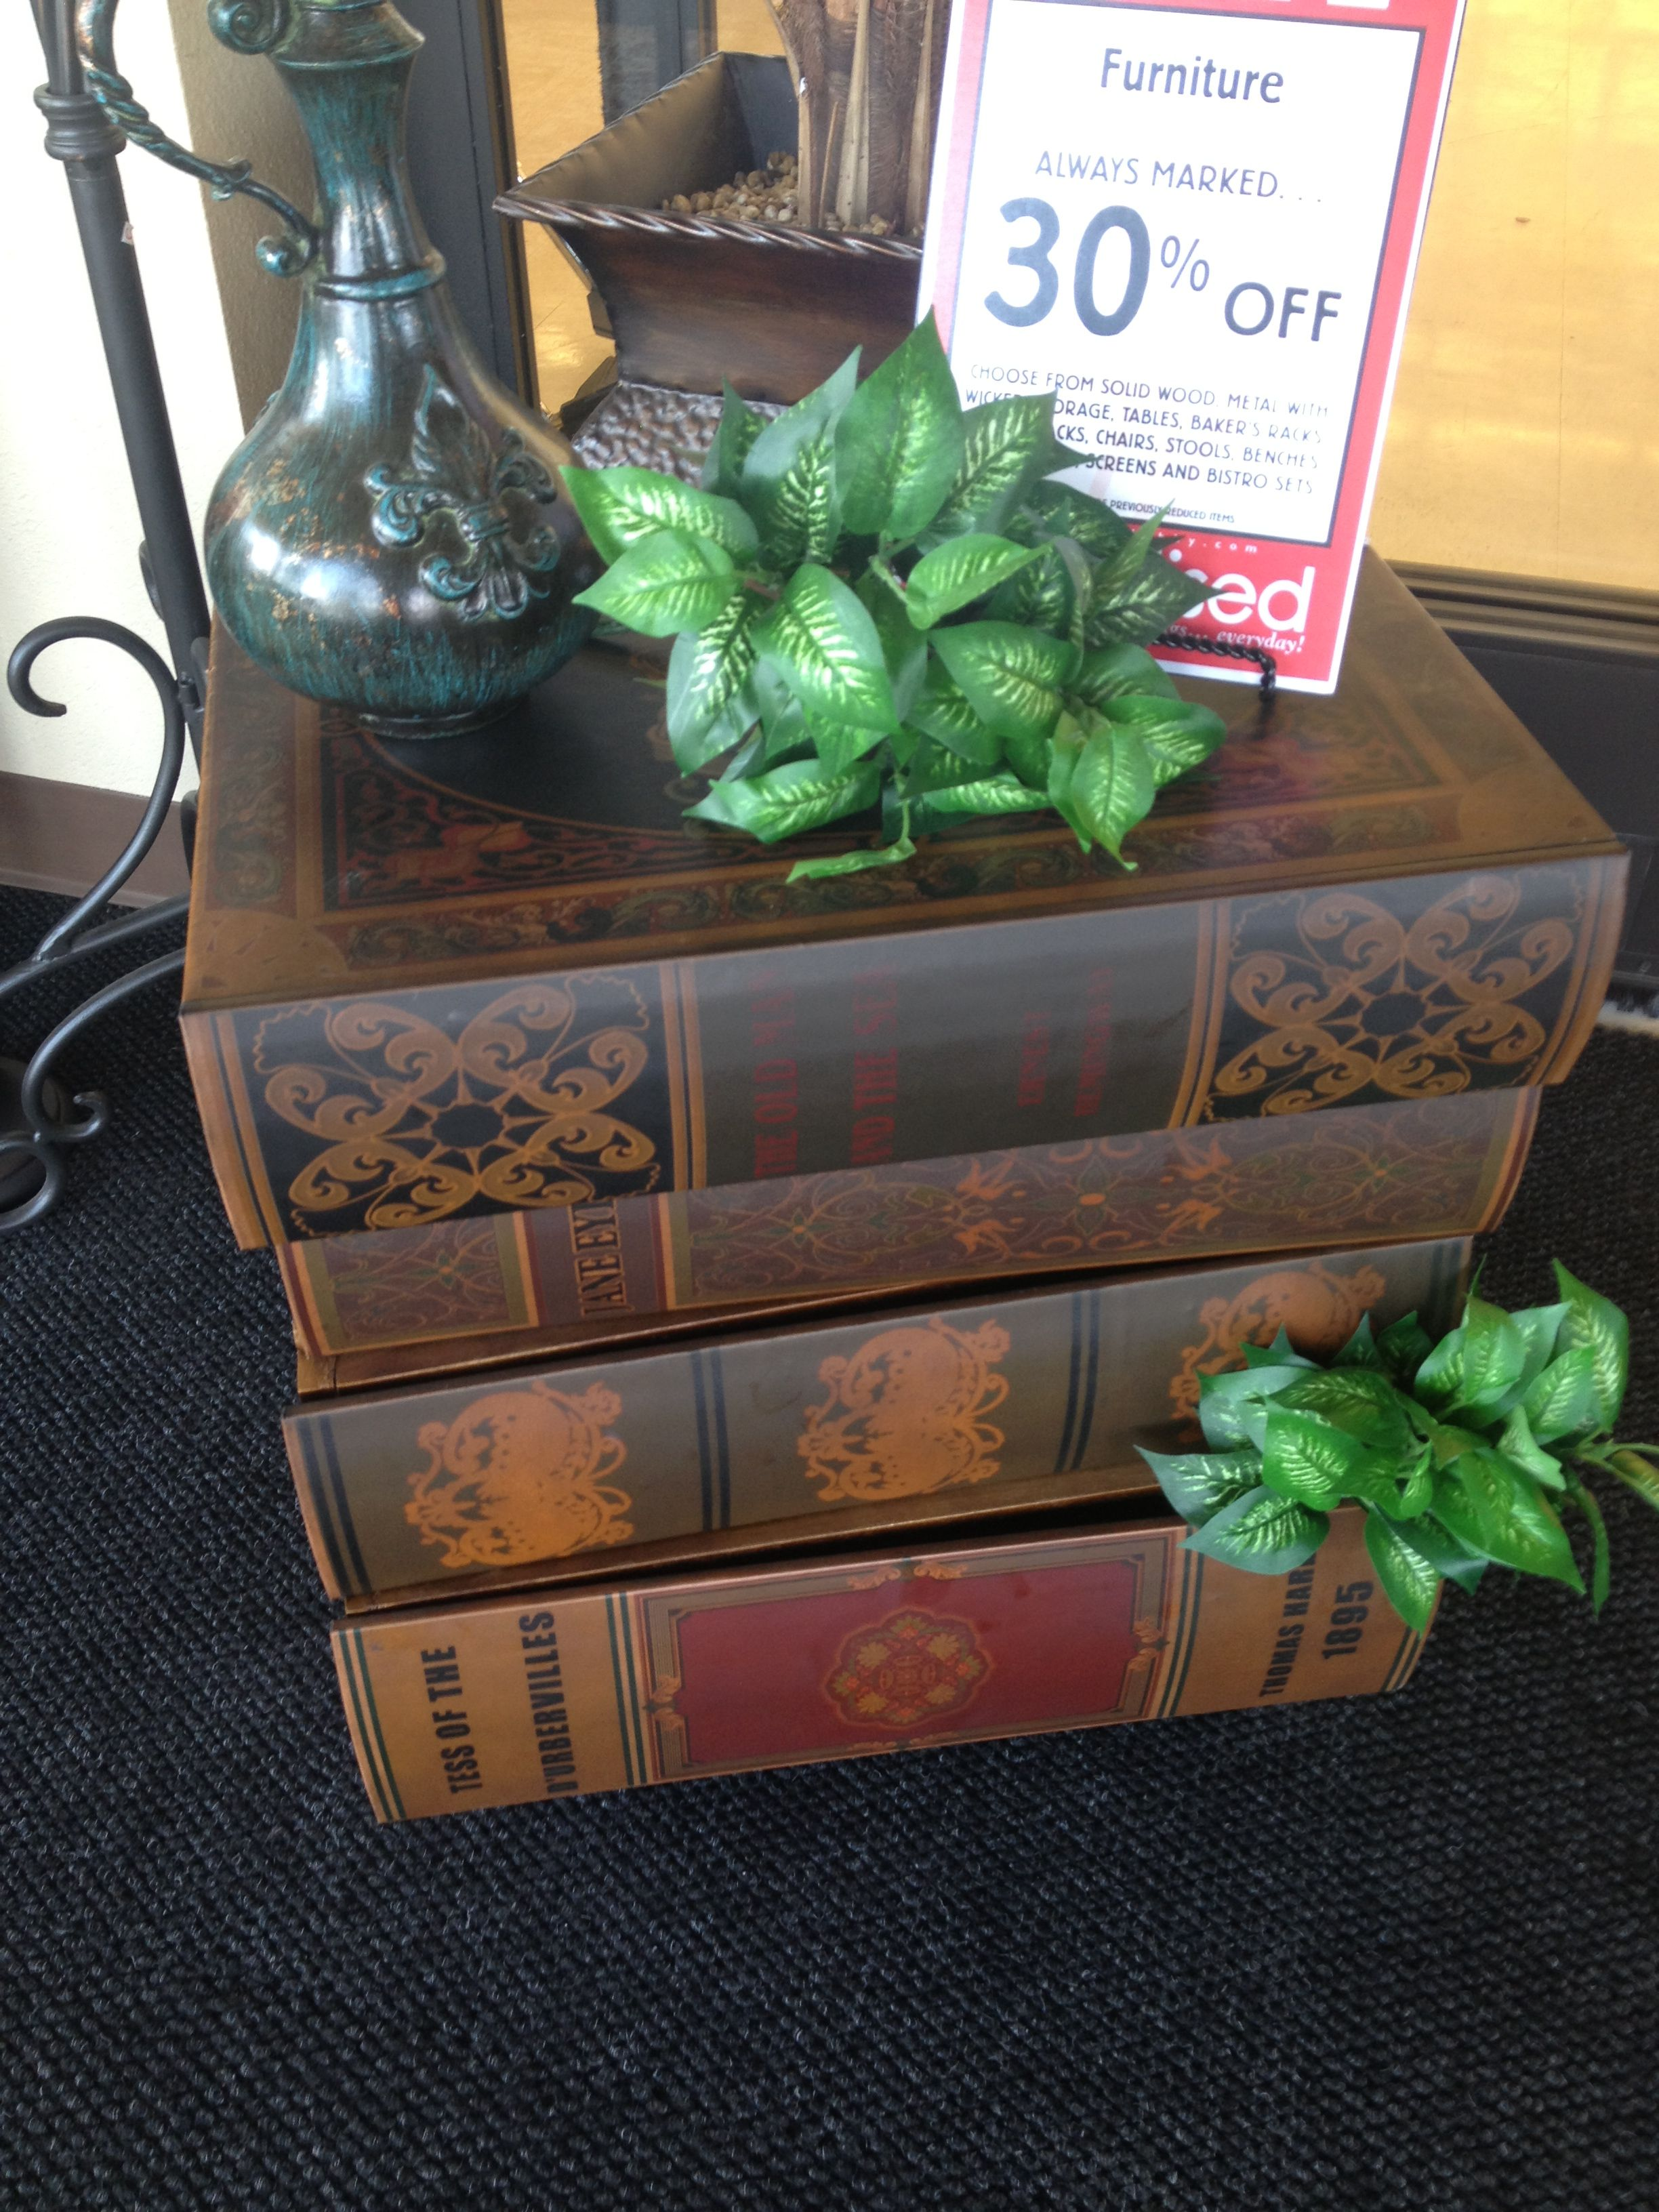 Book Table Decorative Boxes Decor Book Table